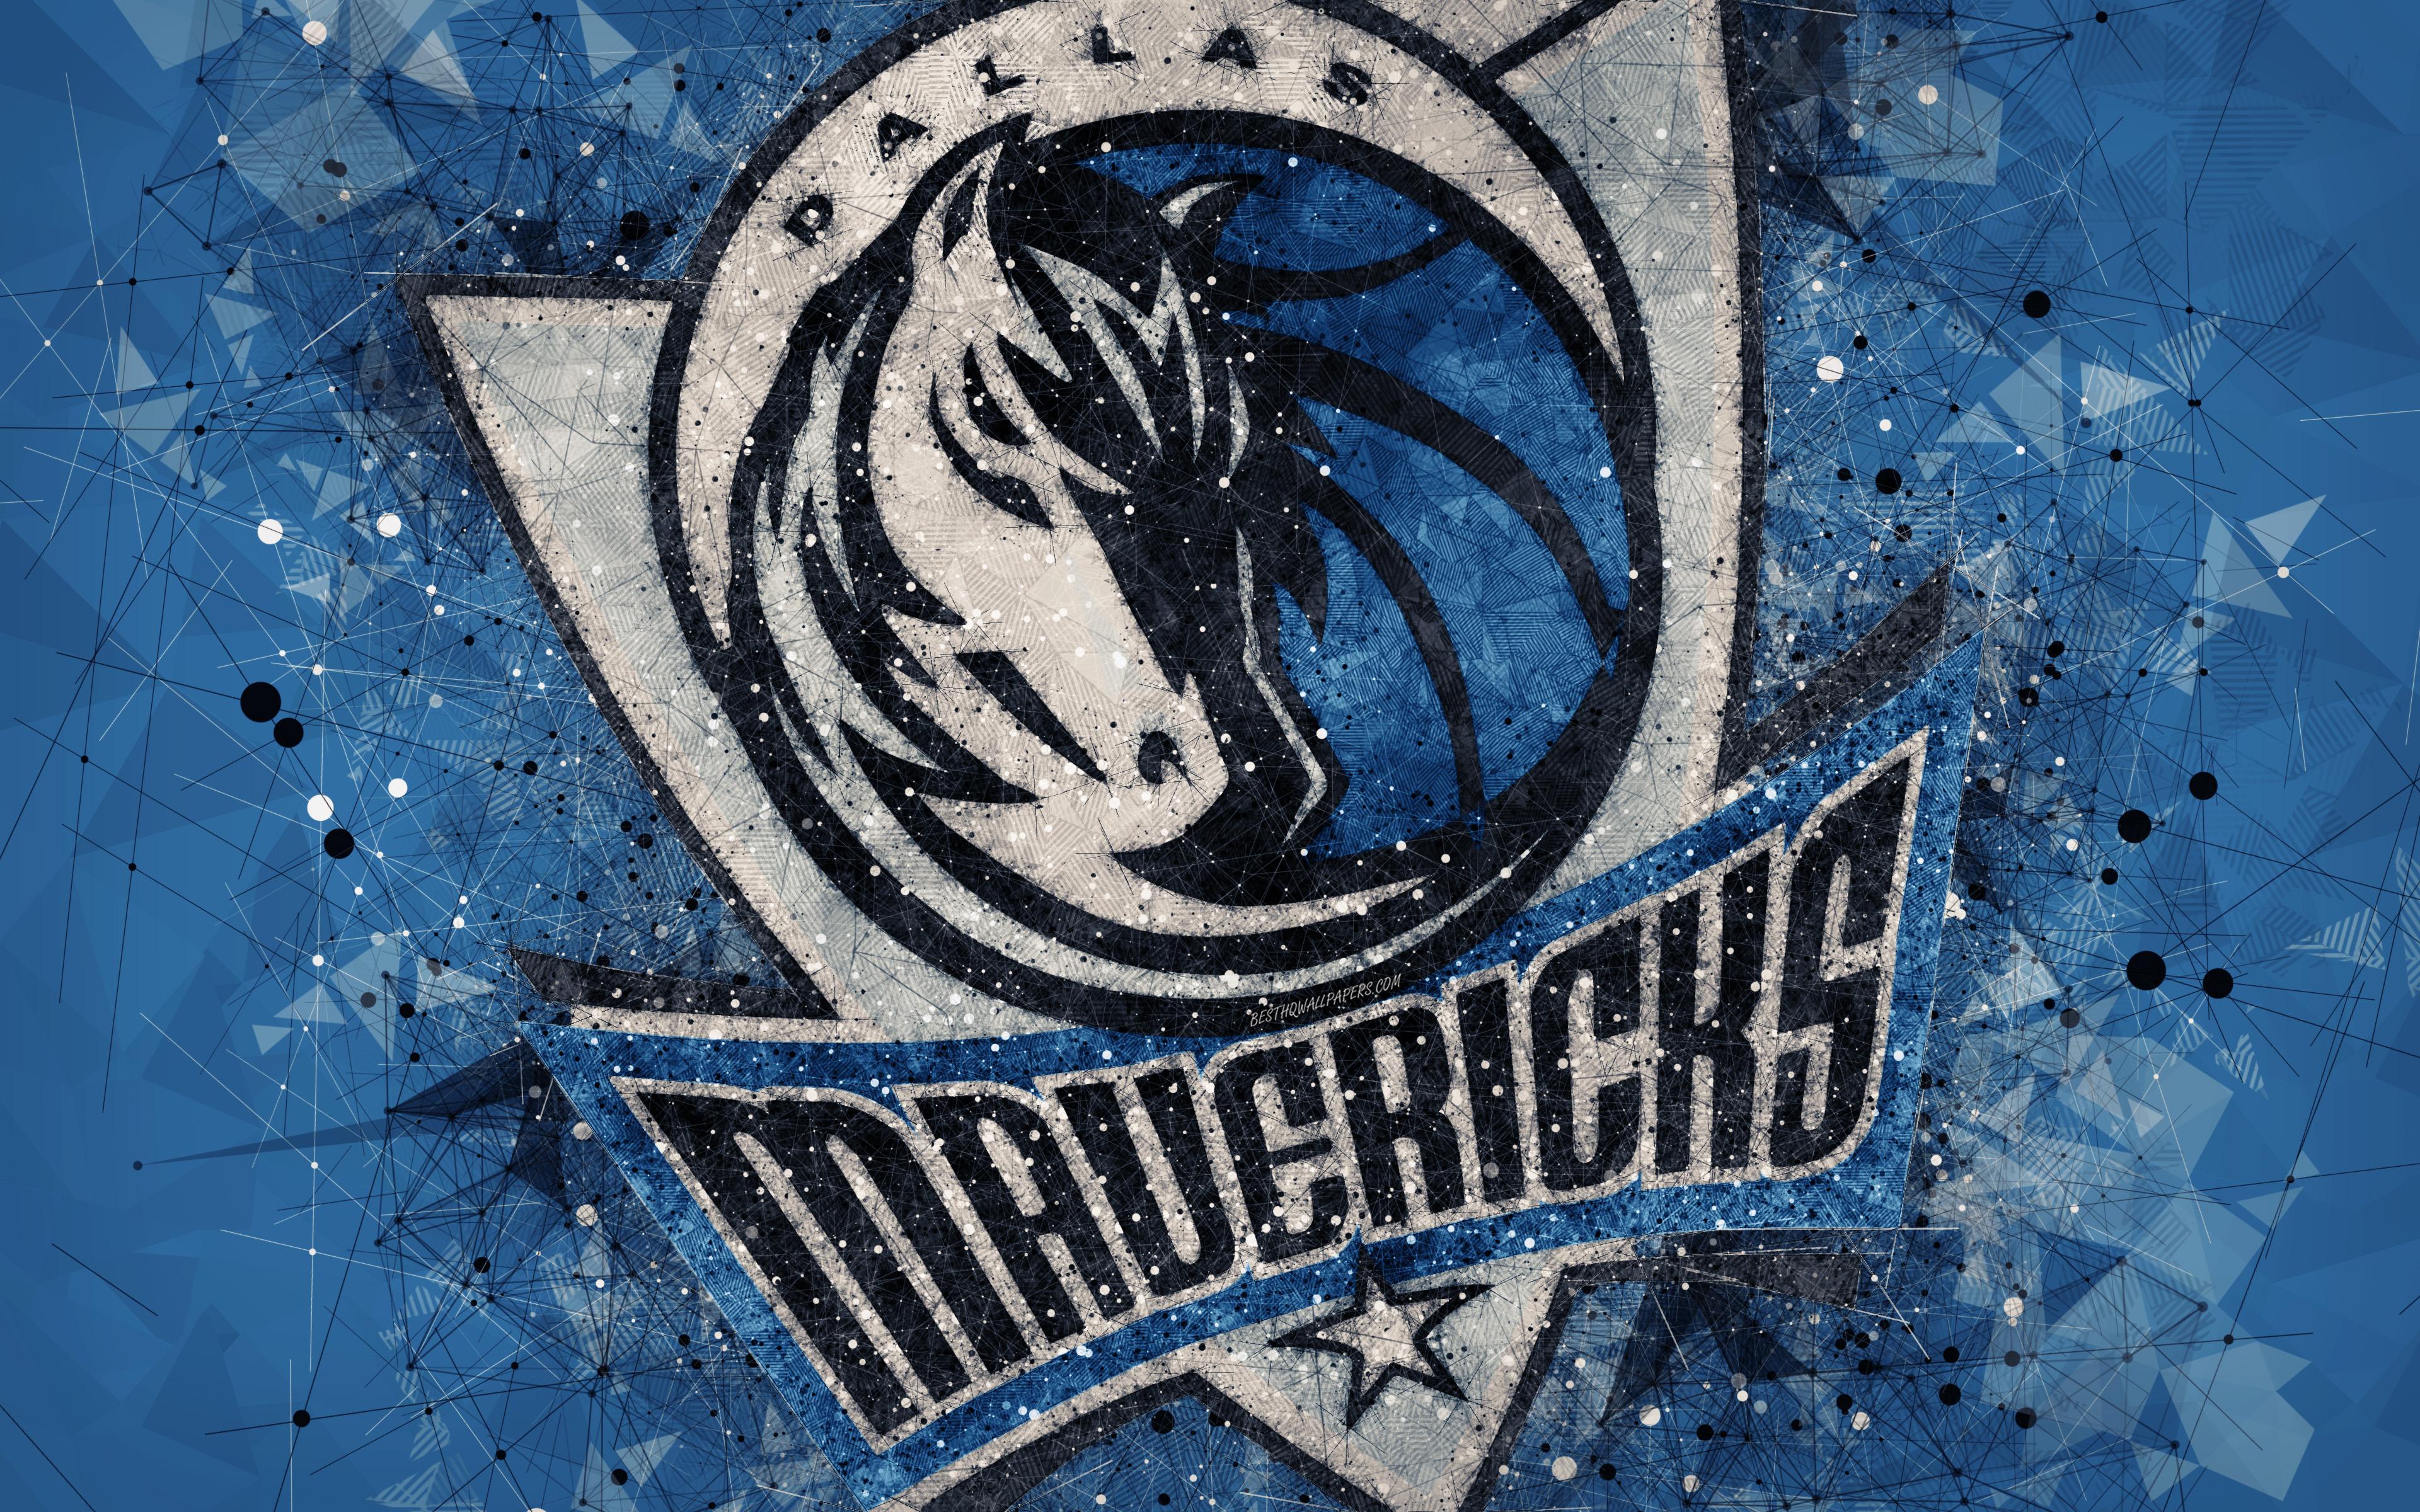 Dallas Mavericks, 4k, Creative Geometric Logo, American - Dallas Mavericks - HD Wallpaper